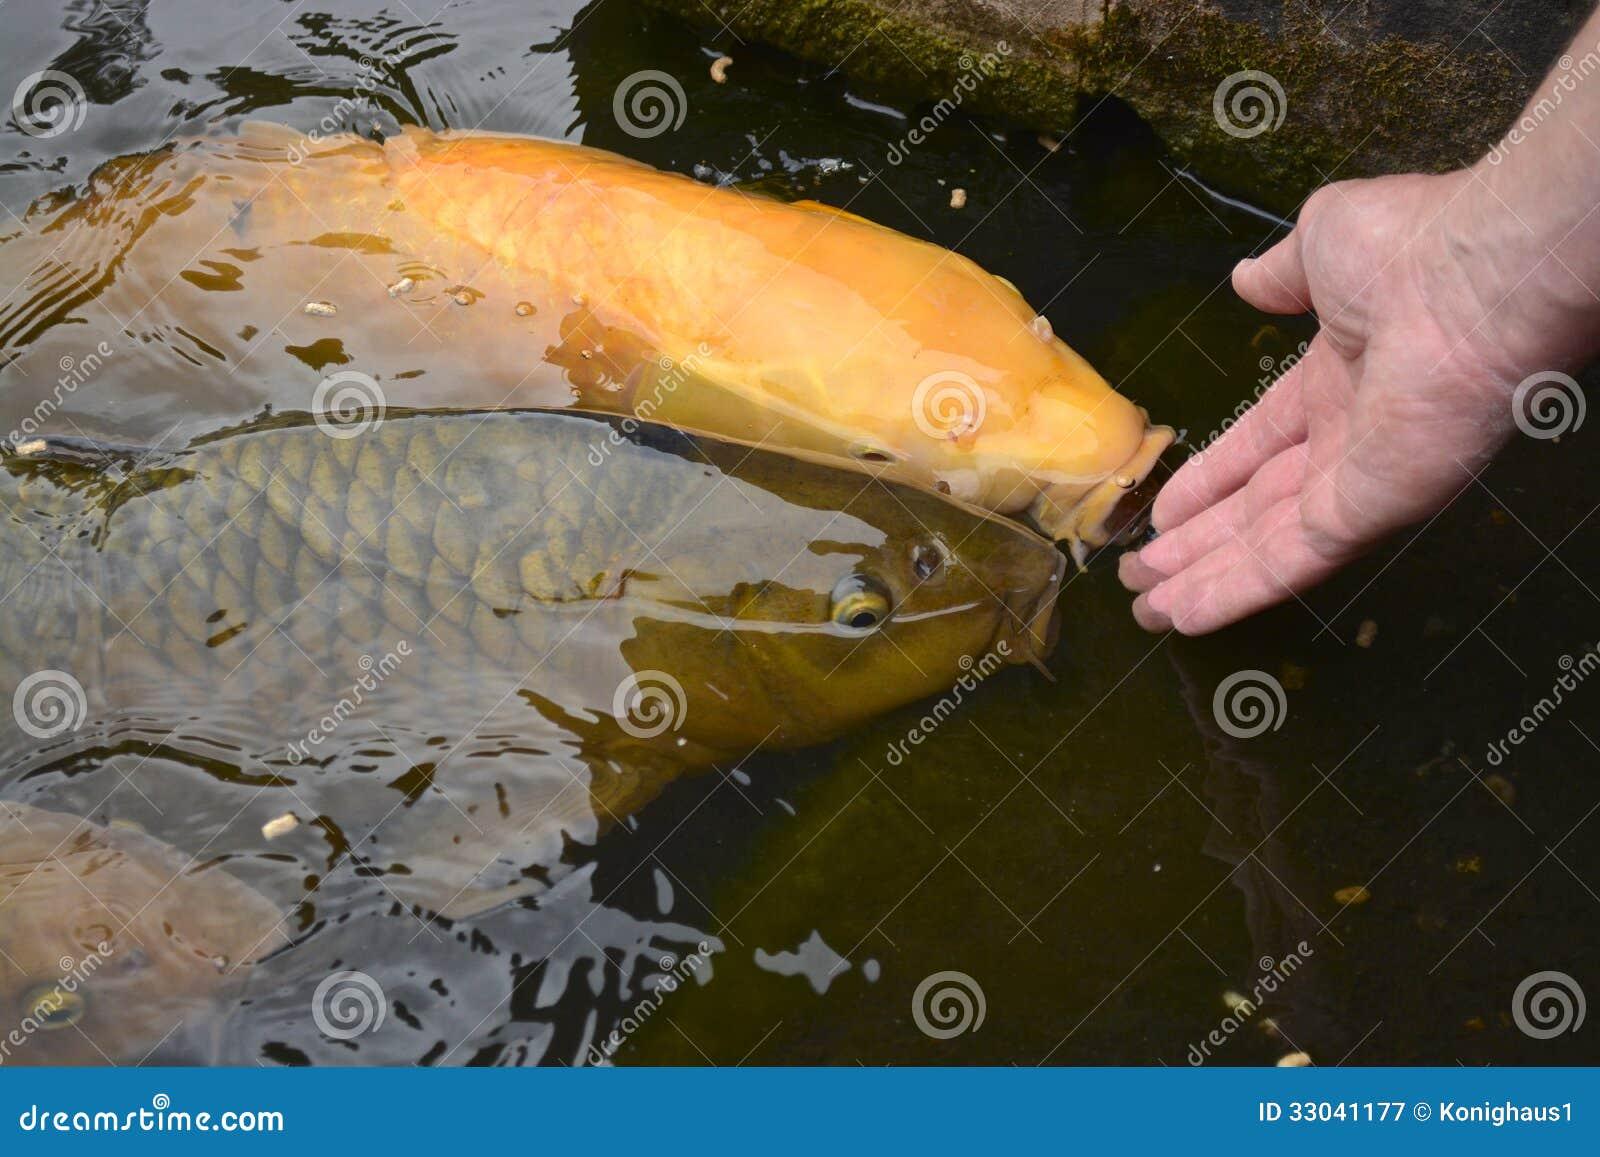 Feeding Fish Royalty Free Stock Photography Image 33041177